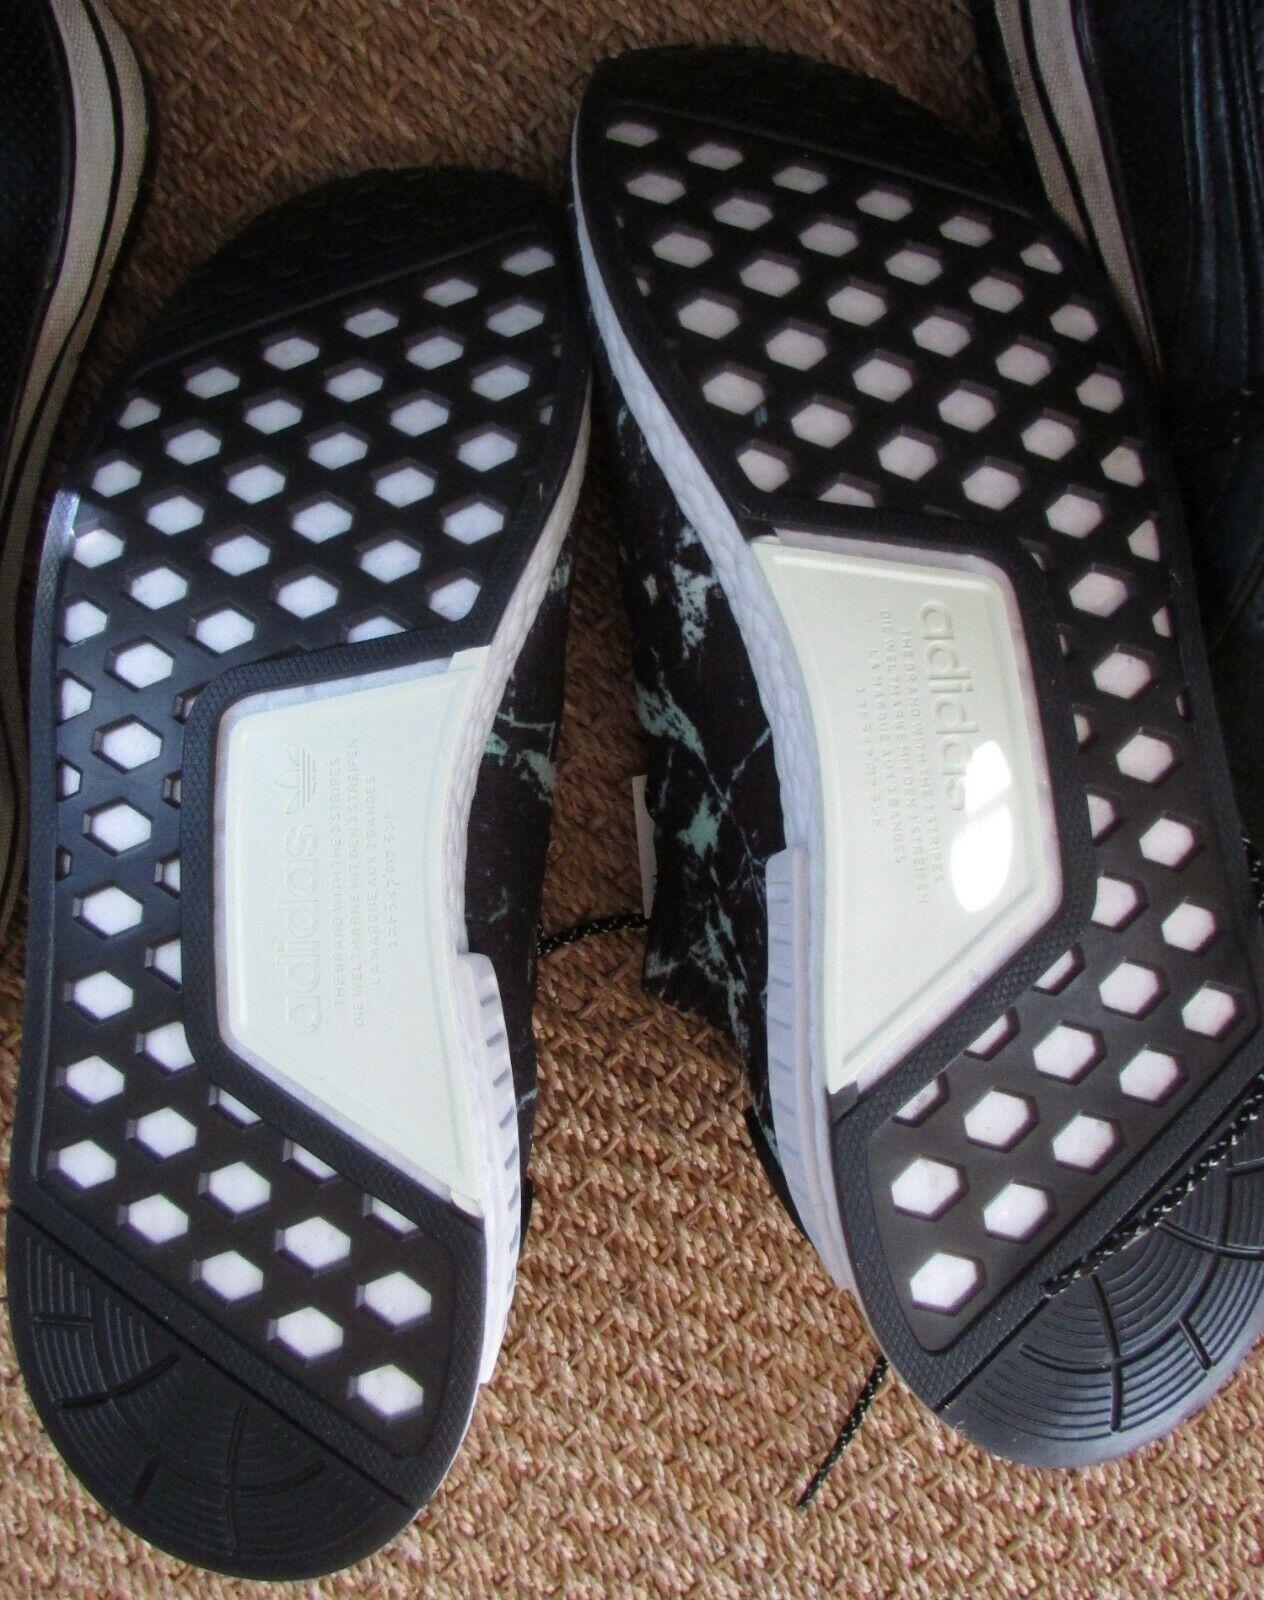 Adidas Adidas Adidas nmd r1 mármol primeknit nuevo en embalaje original tamaño 10.5 bb7996 0776a5